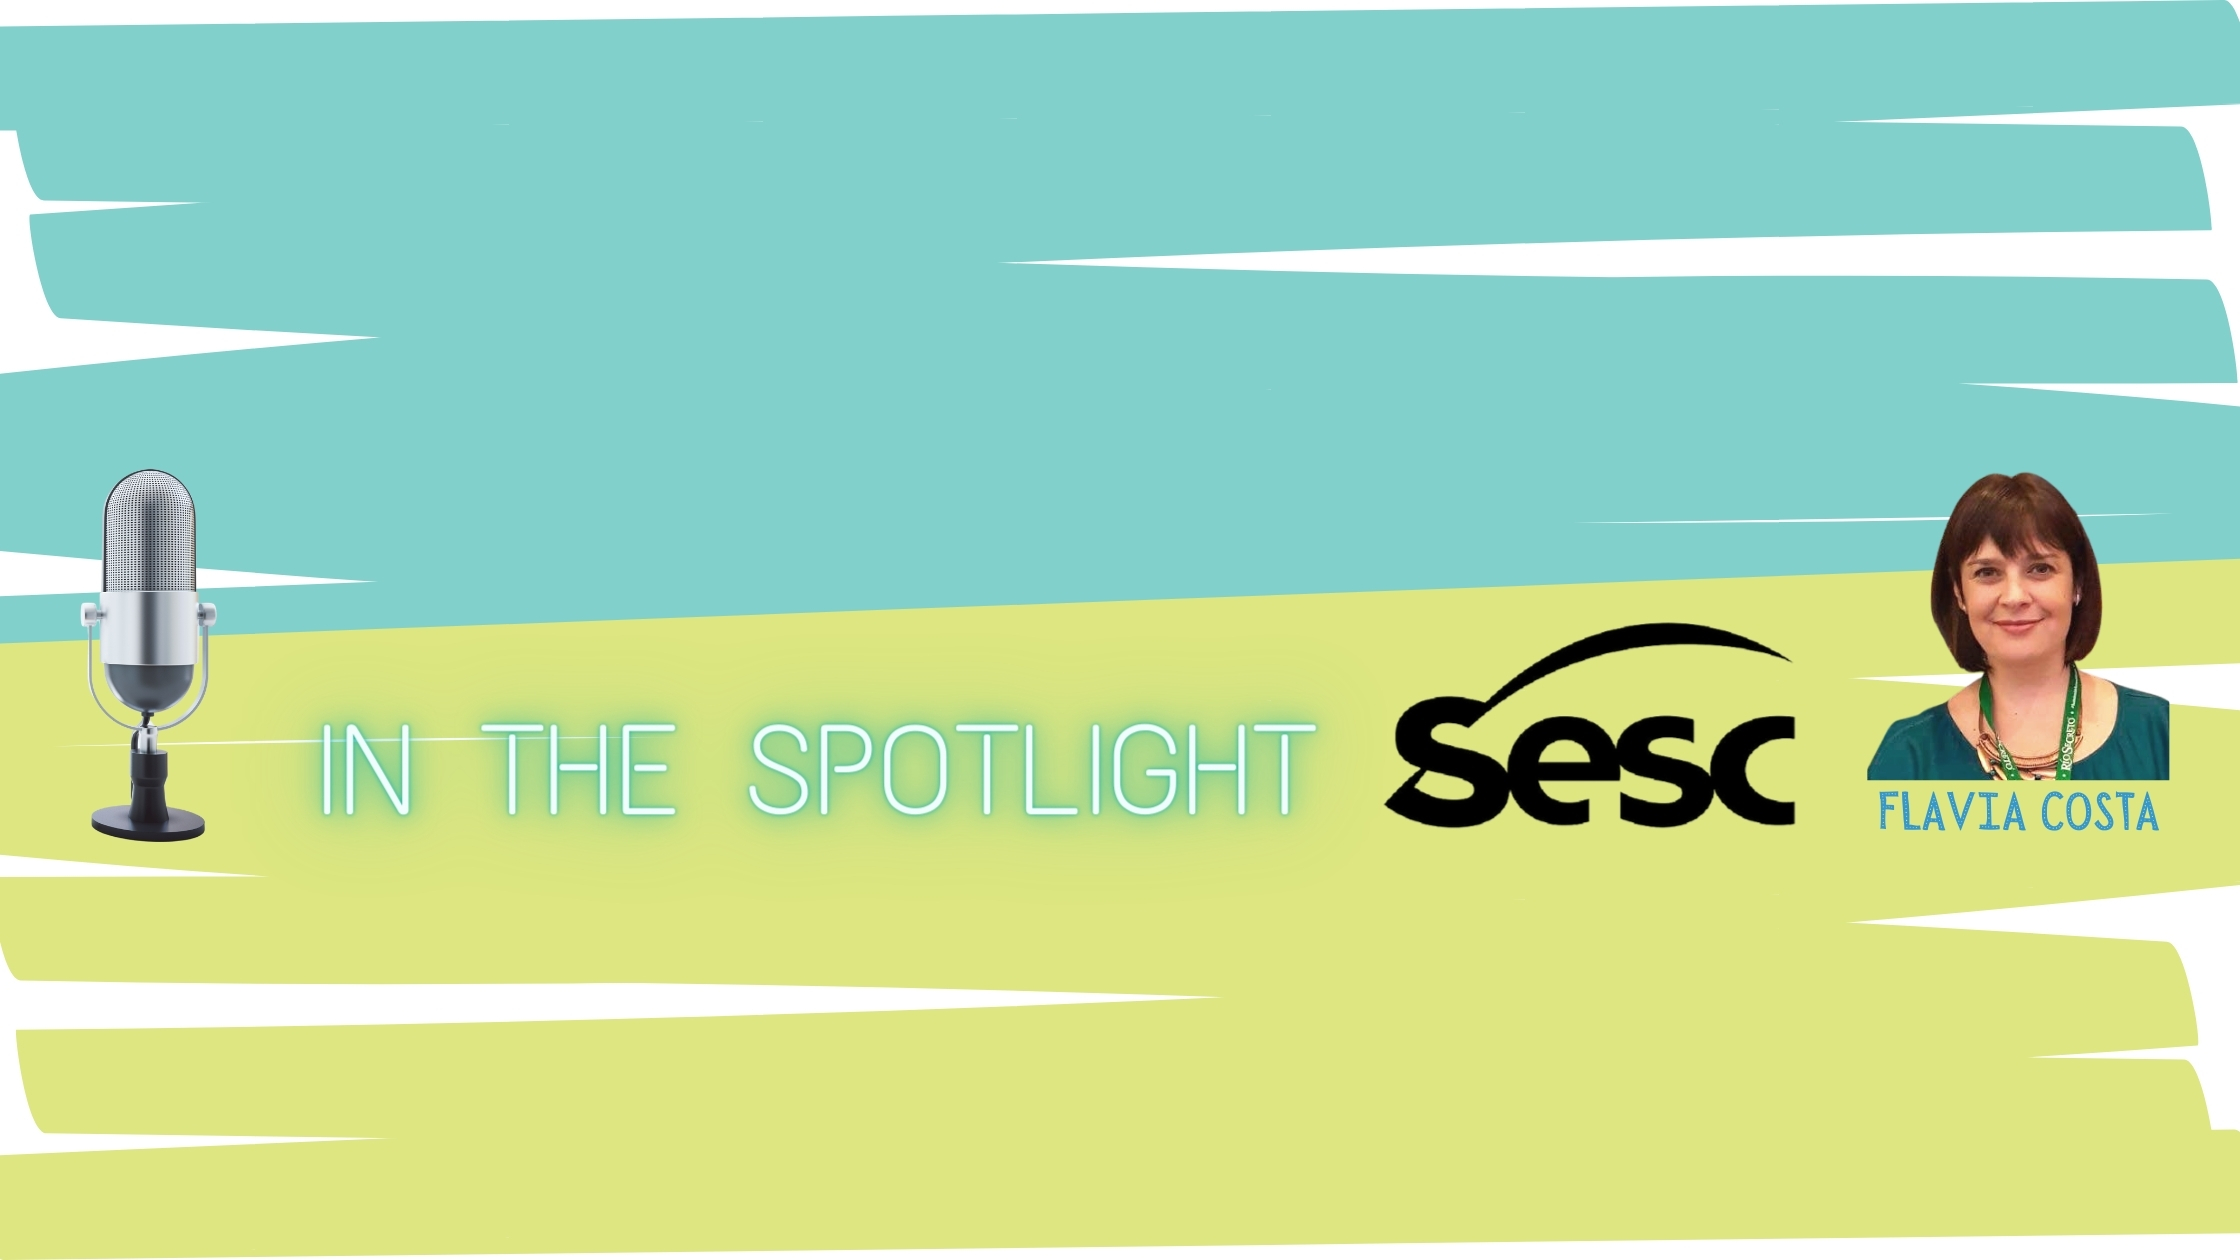 In the Spotlight con Sesc São Paulo